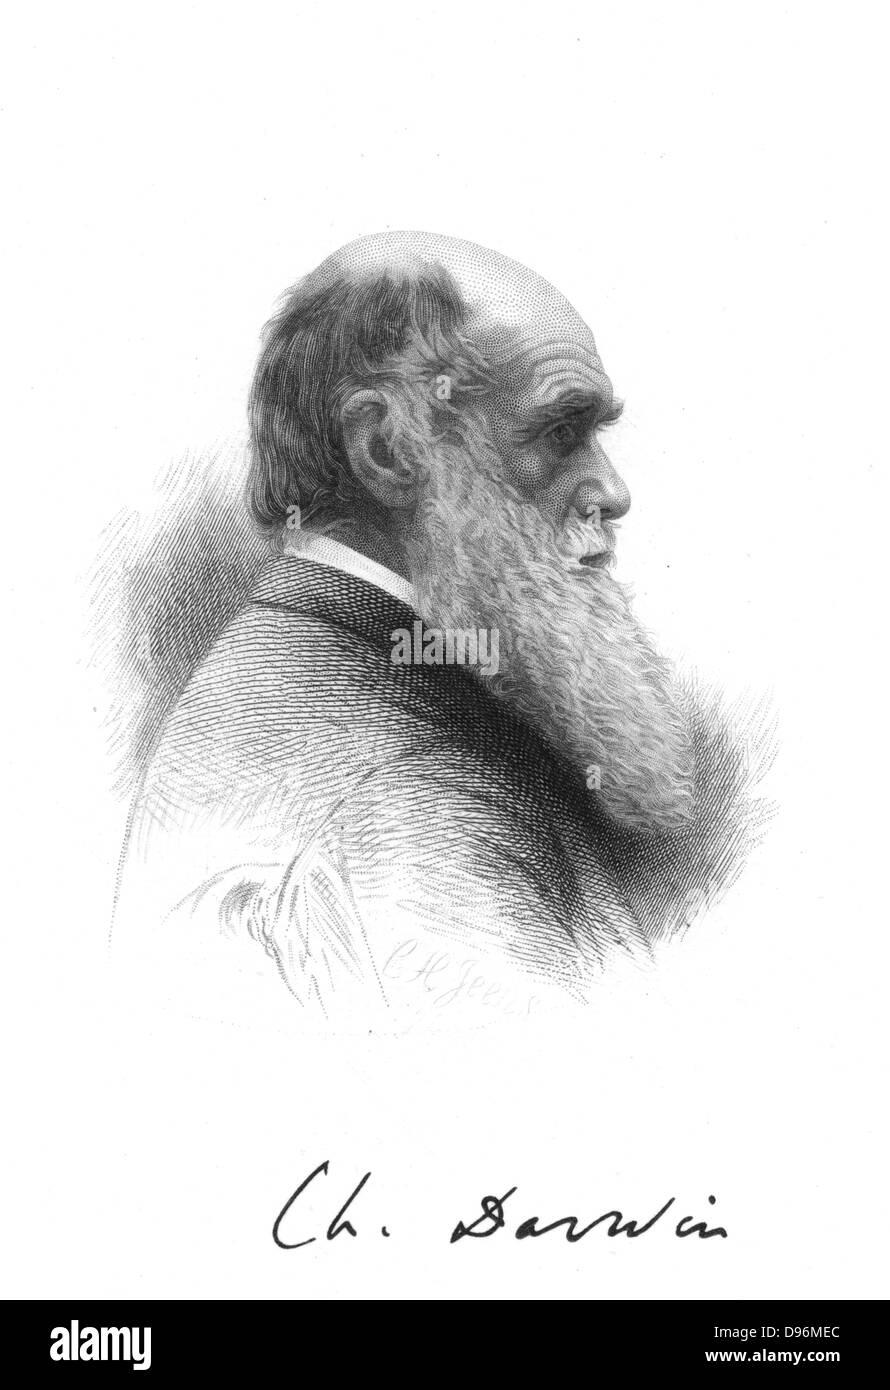 Evolution Theory Stockfotos & Evolution Theory Bilder - Seite 2 - Alamy